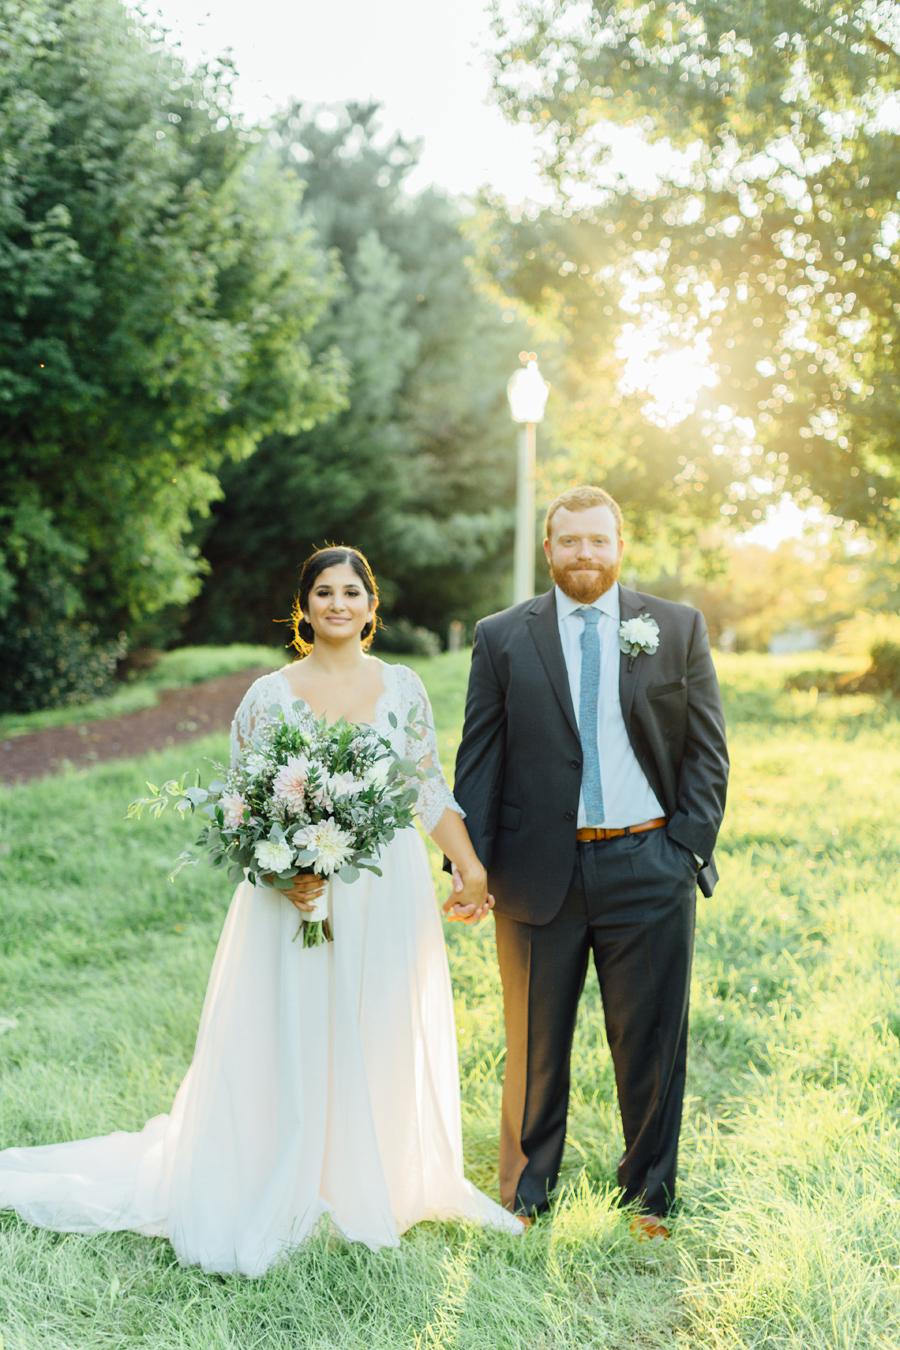 the-inn-at-leola-wedding-lancaster-pennsylvania-wedding-photographer-rebeka-viola-photograhy (73).jpg